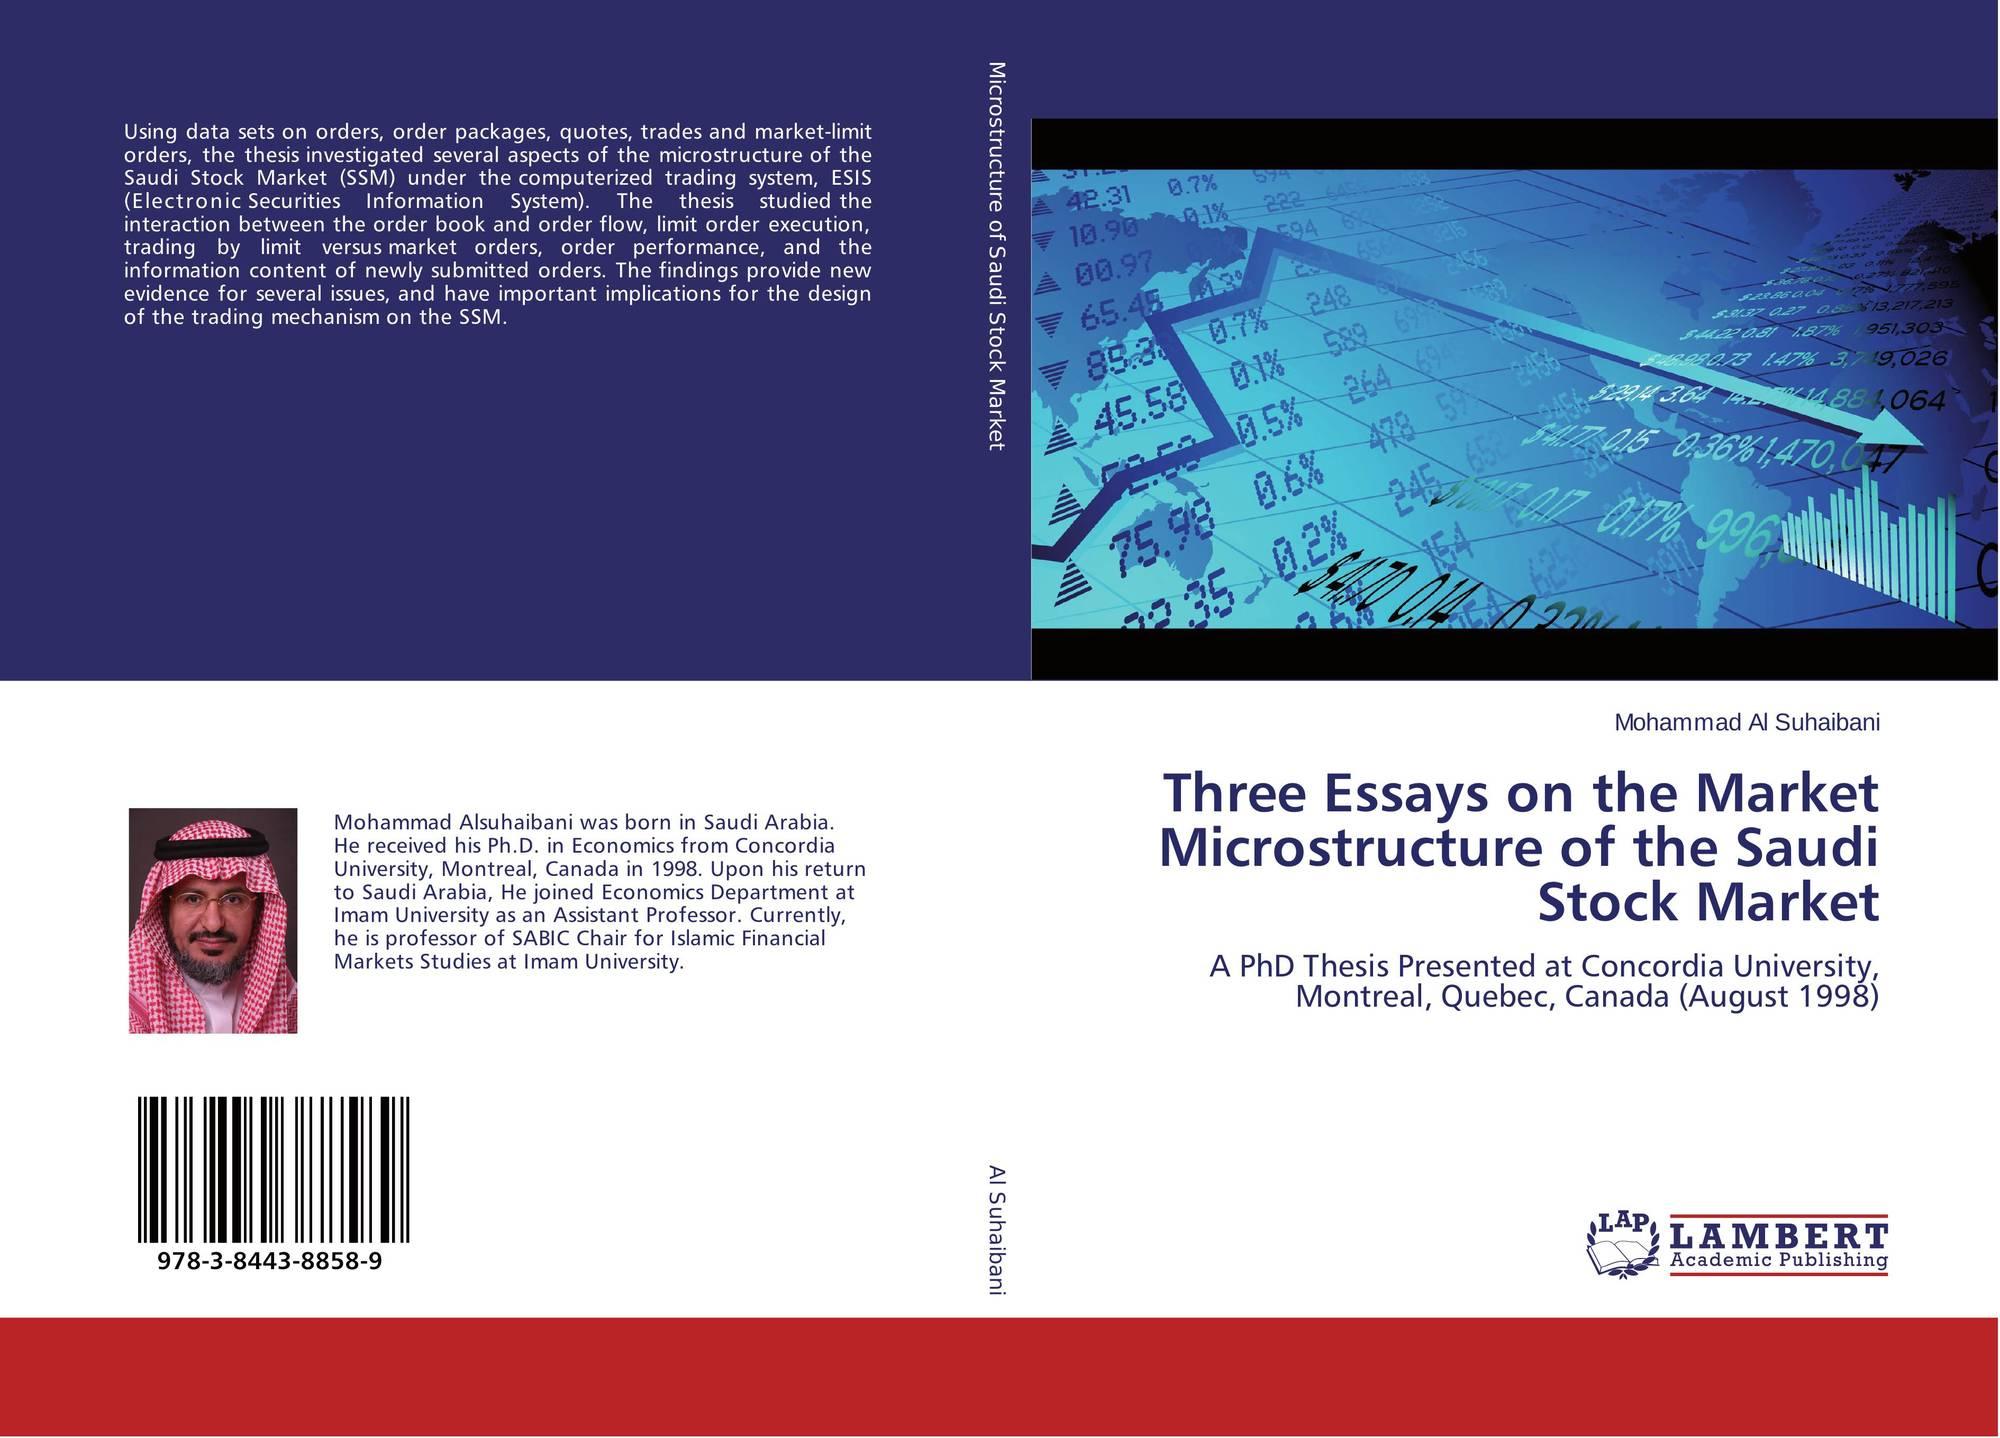 Three Essays On The Market Microstructure Of The Saudi Stock Market